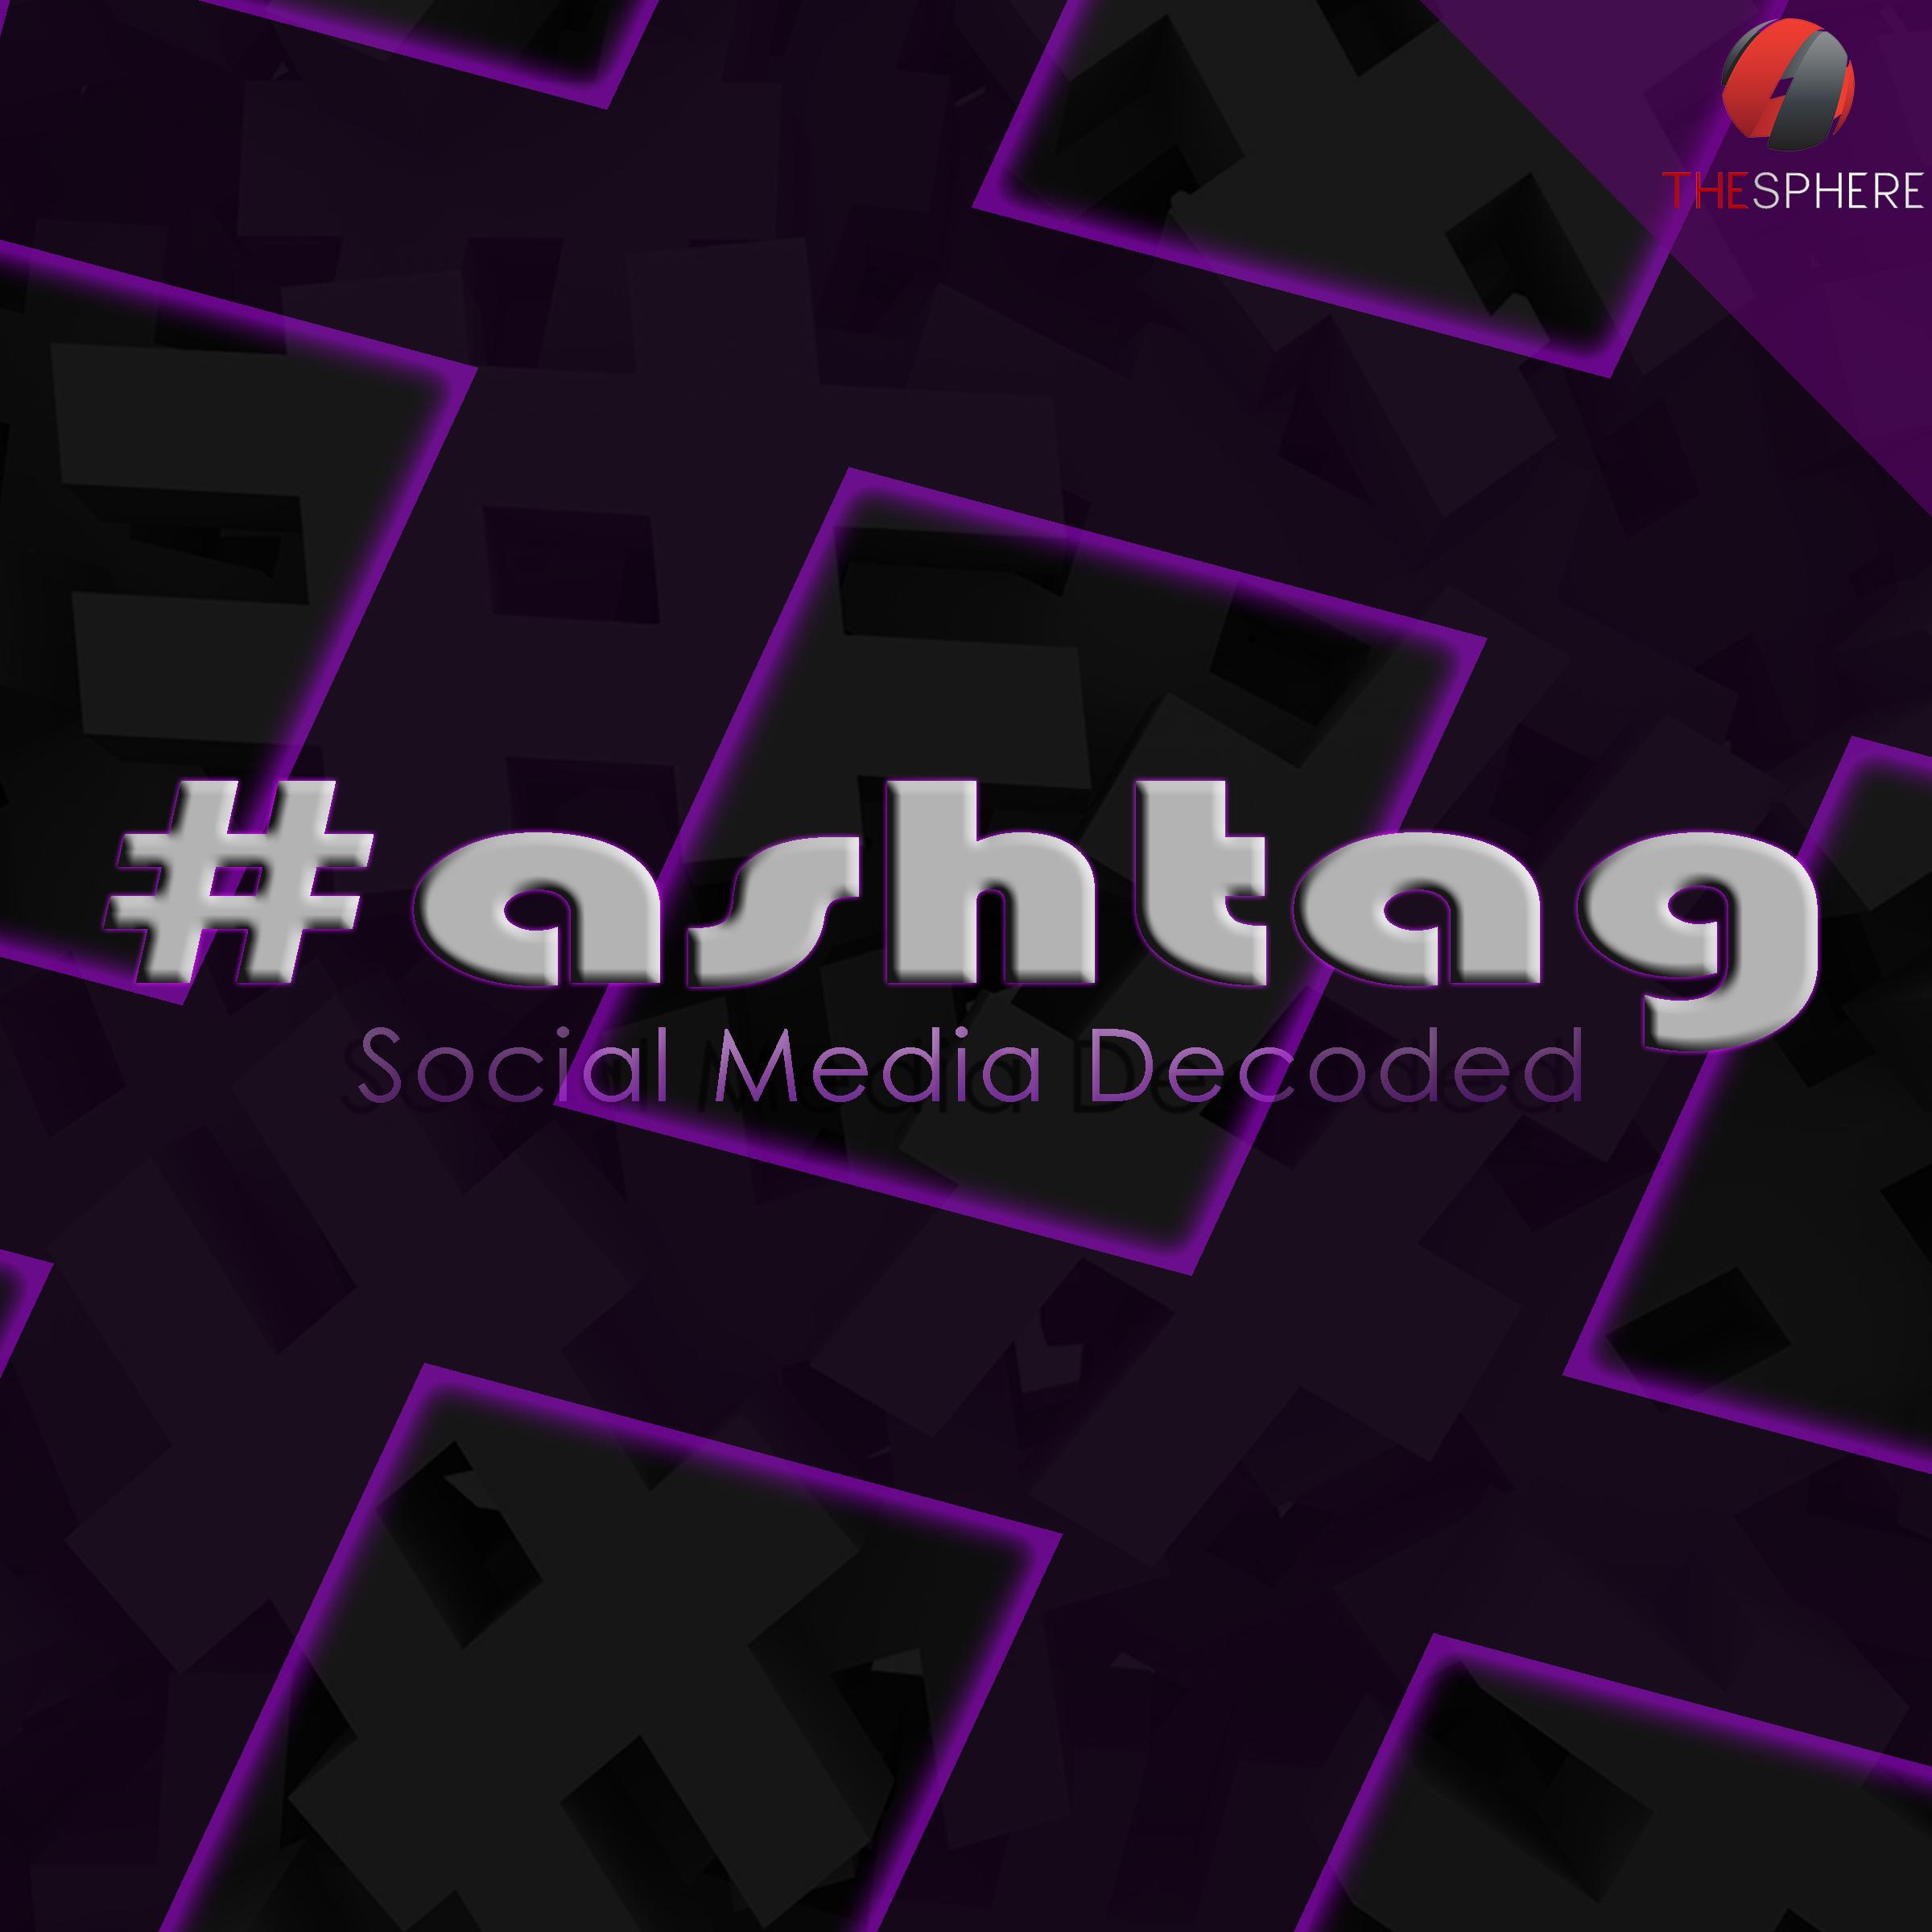 Hashtag final rotated.jpg